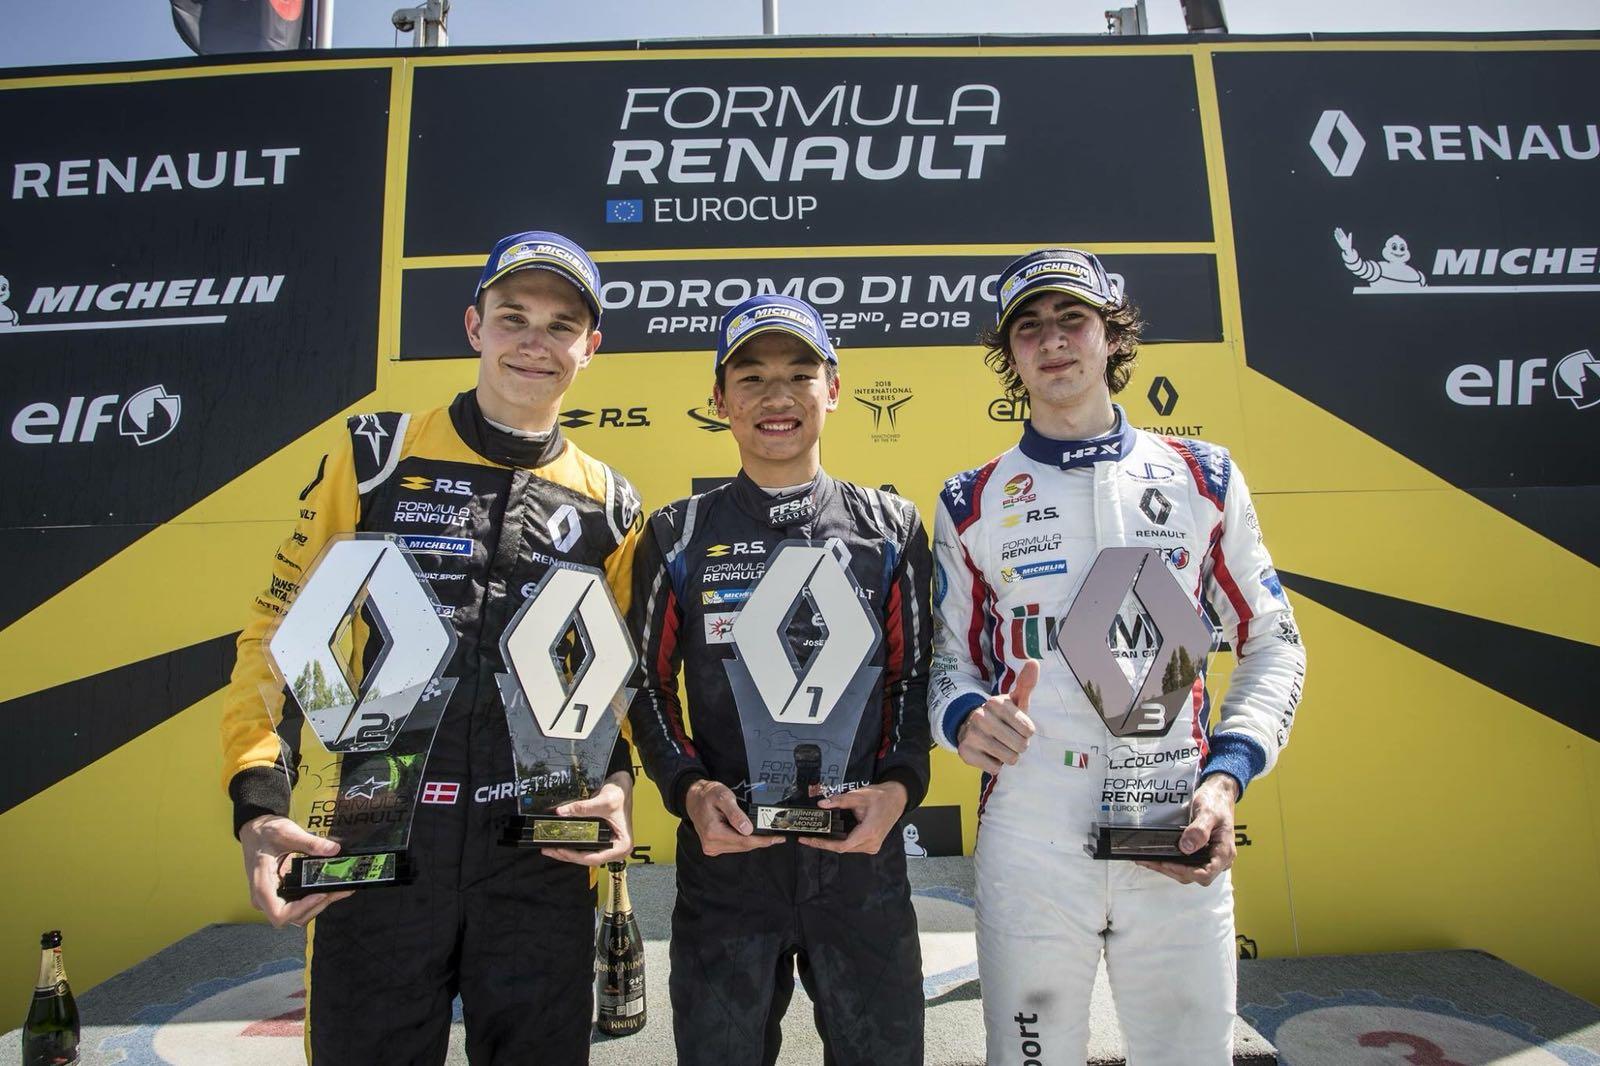 Formula Renault Eurocup